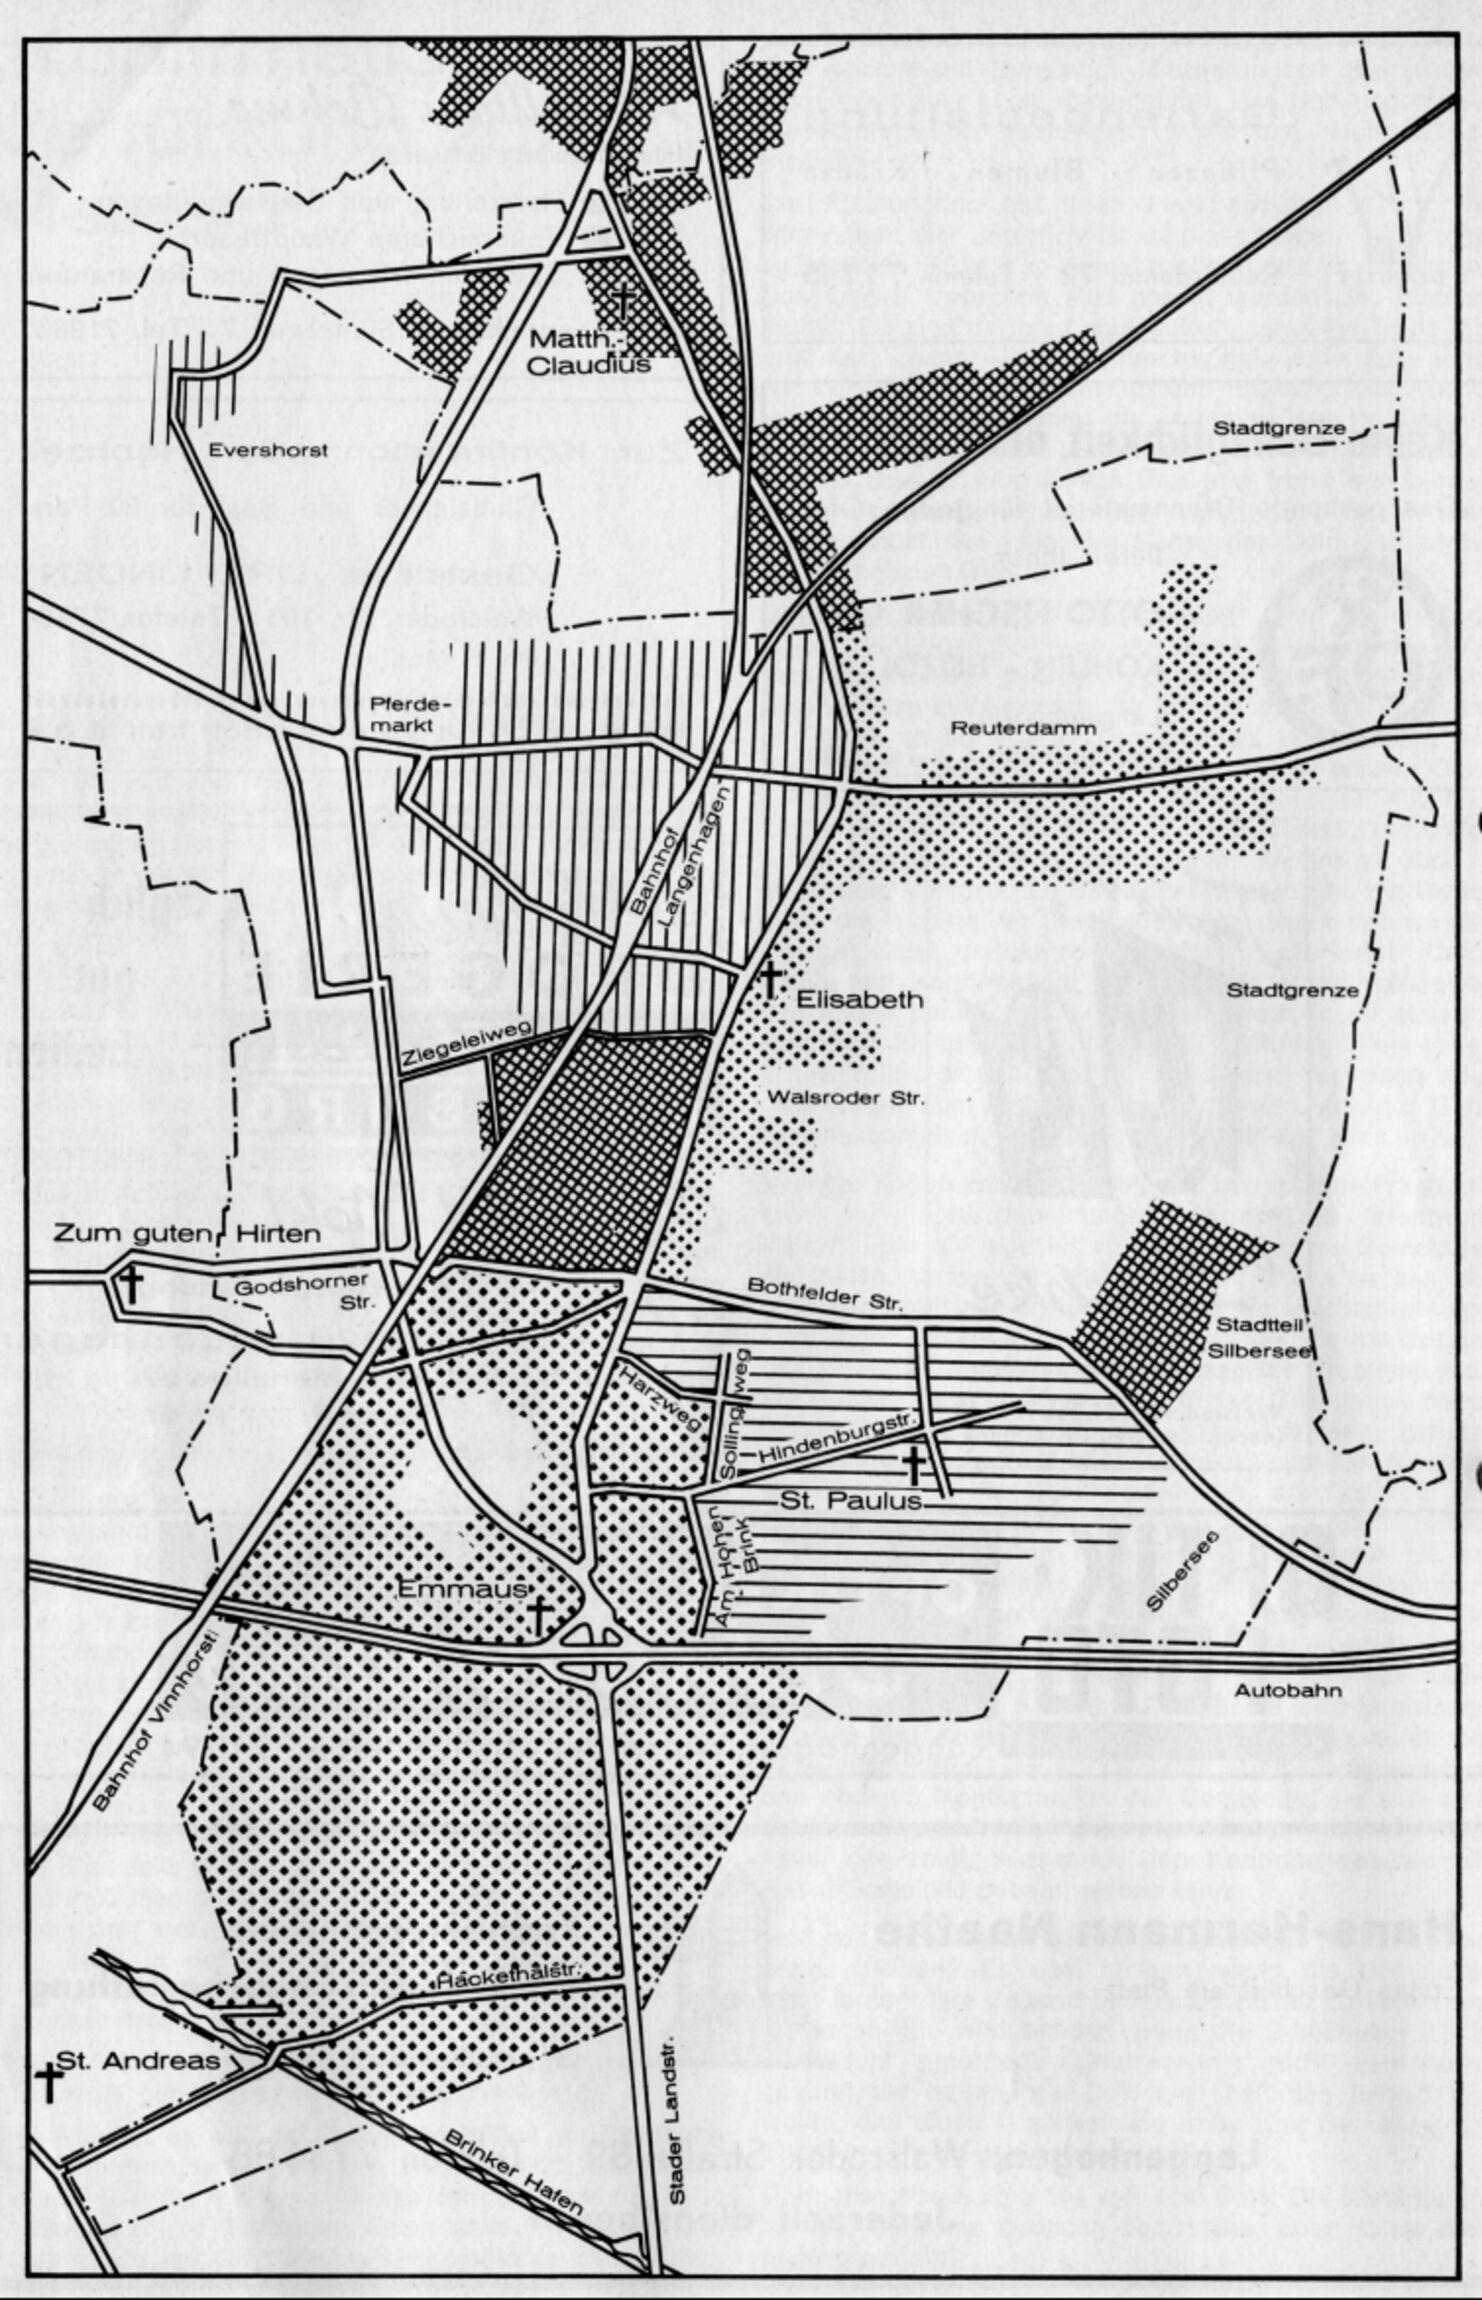 Gebietskarte der  Gemeinden in Langenhagen